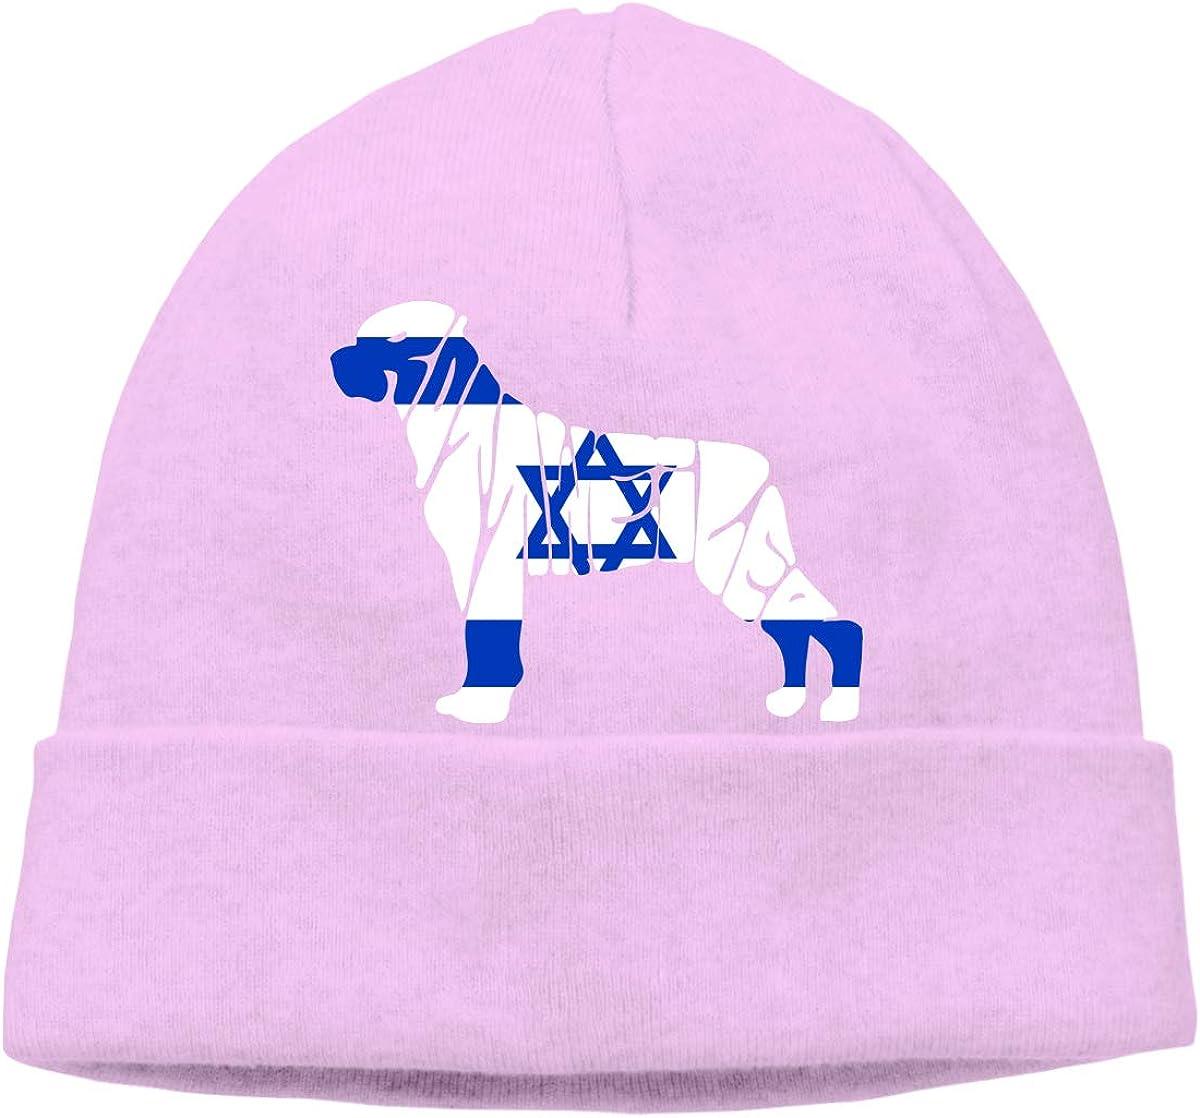 BF5Y3z/&MA Israel Flag Rottweiler Dog Beanie Hat for Men Women,Soft Hedging Cap Skull Cap